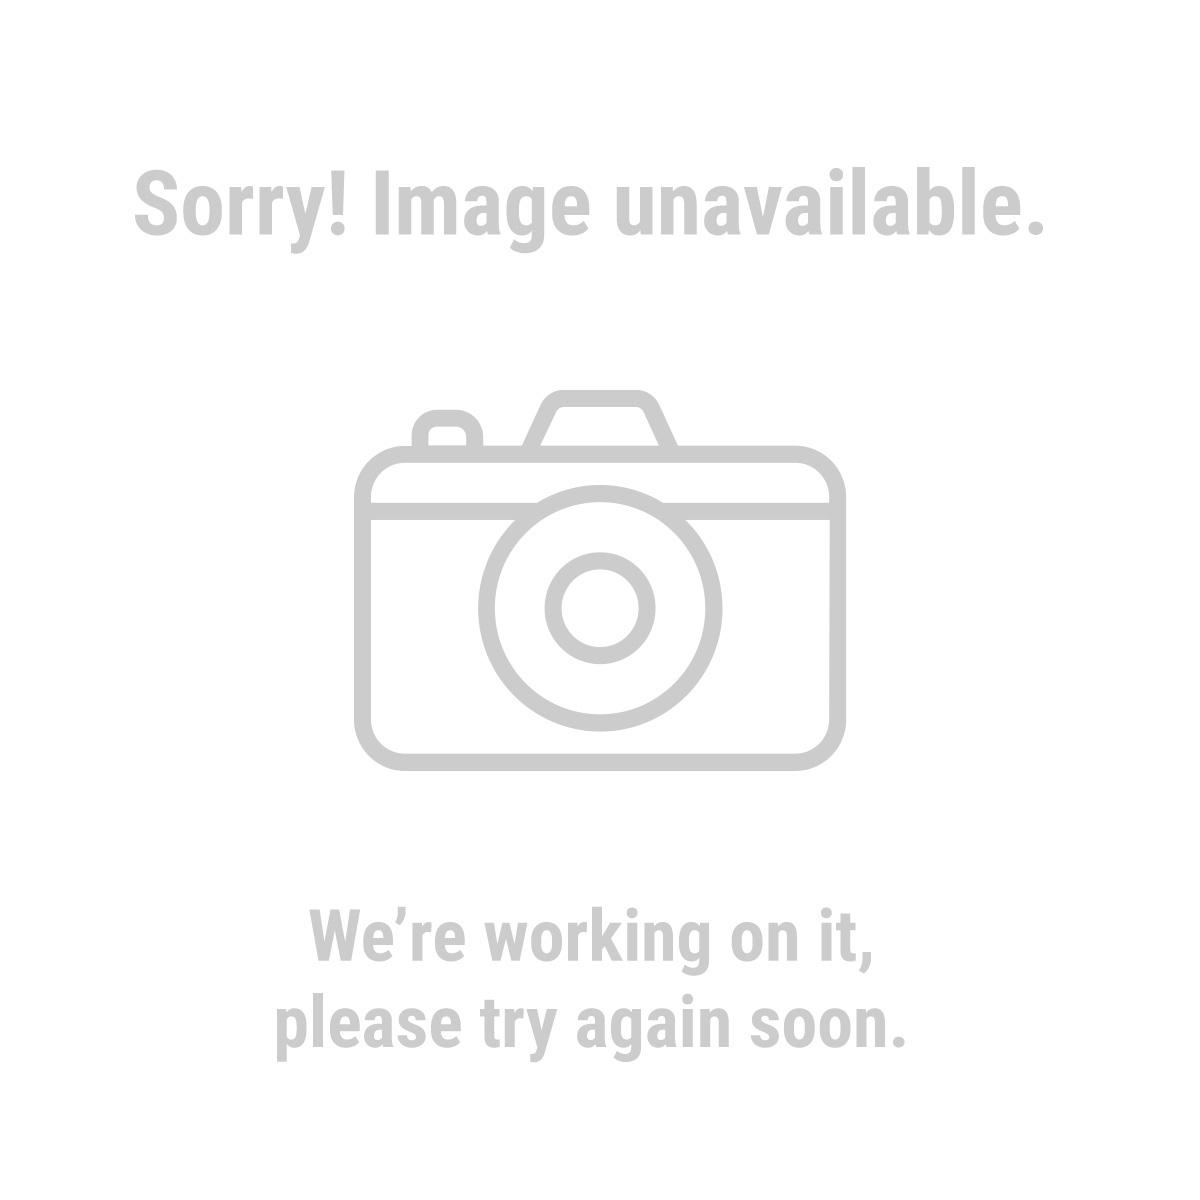 HFT 65178 Trunk Organizer